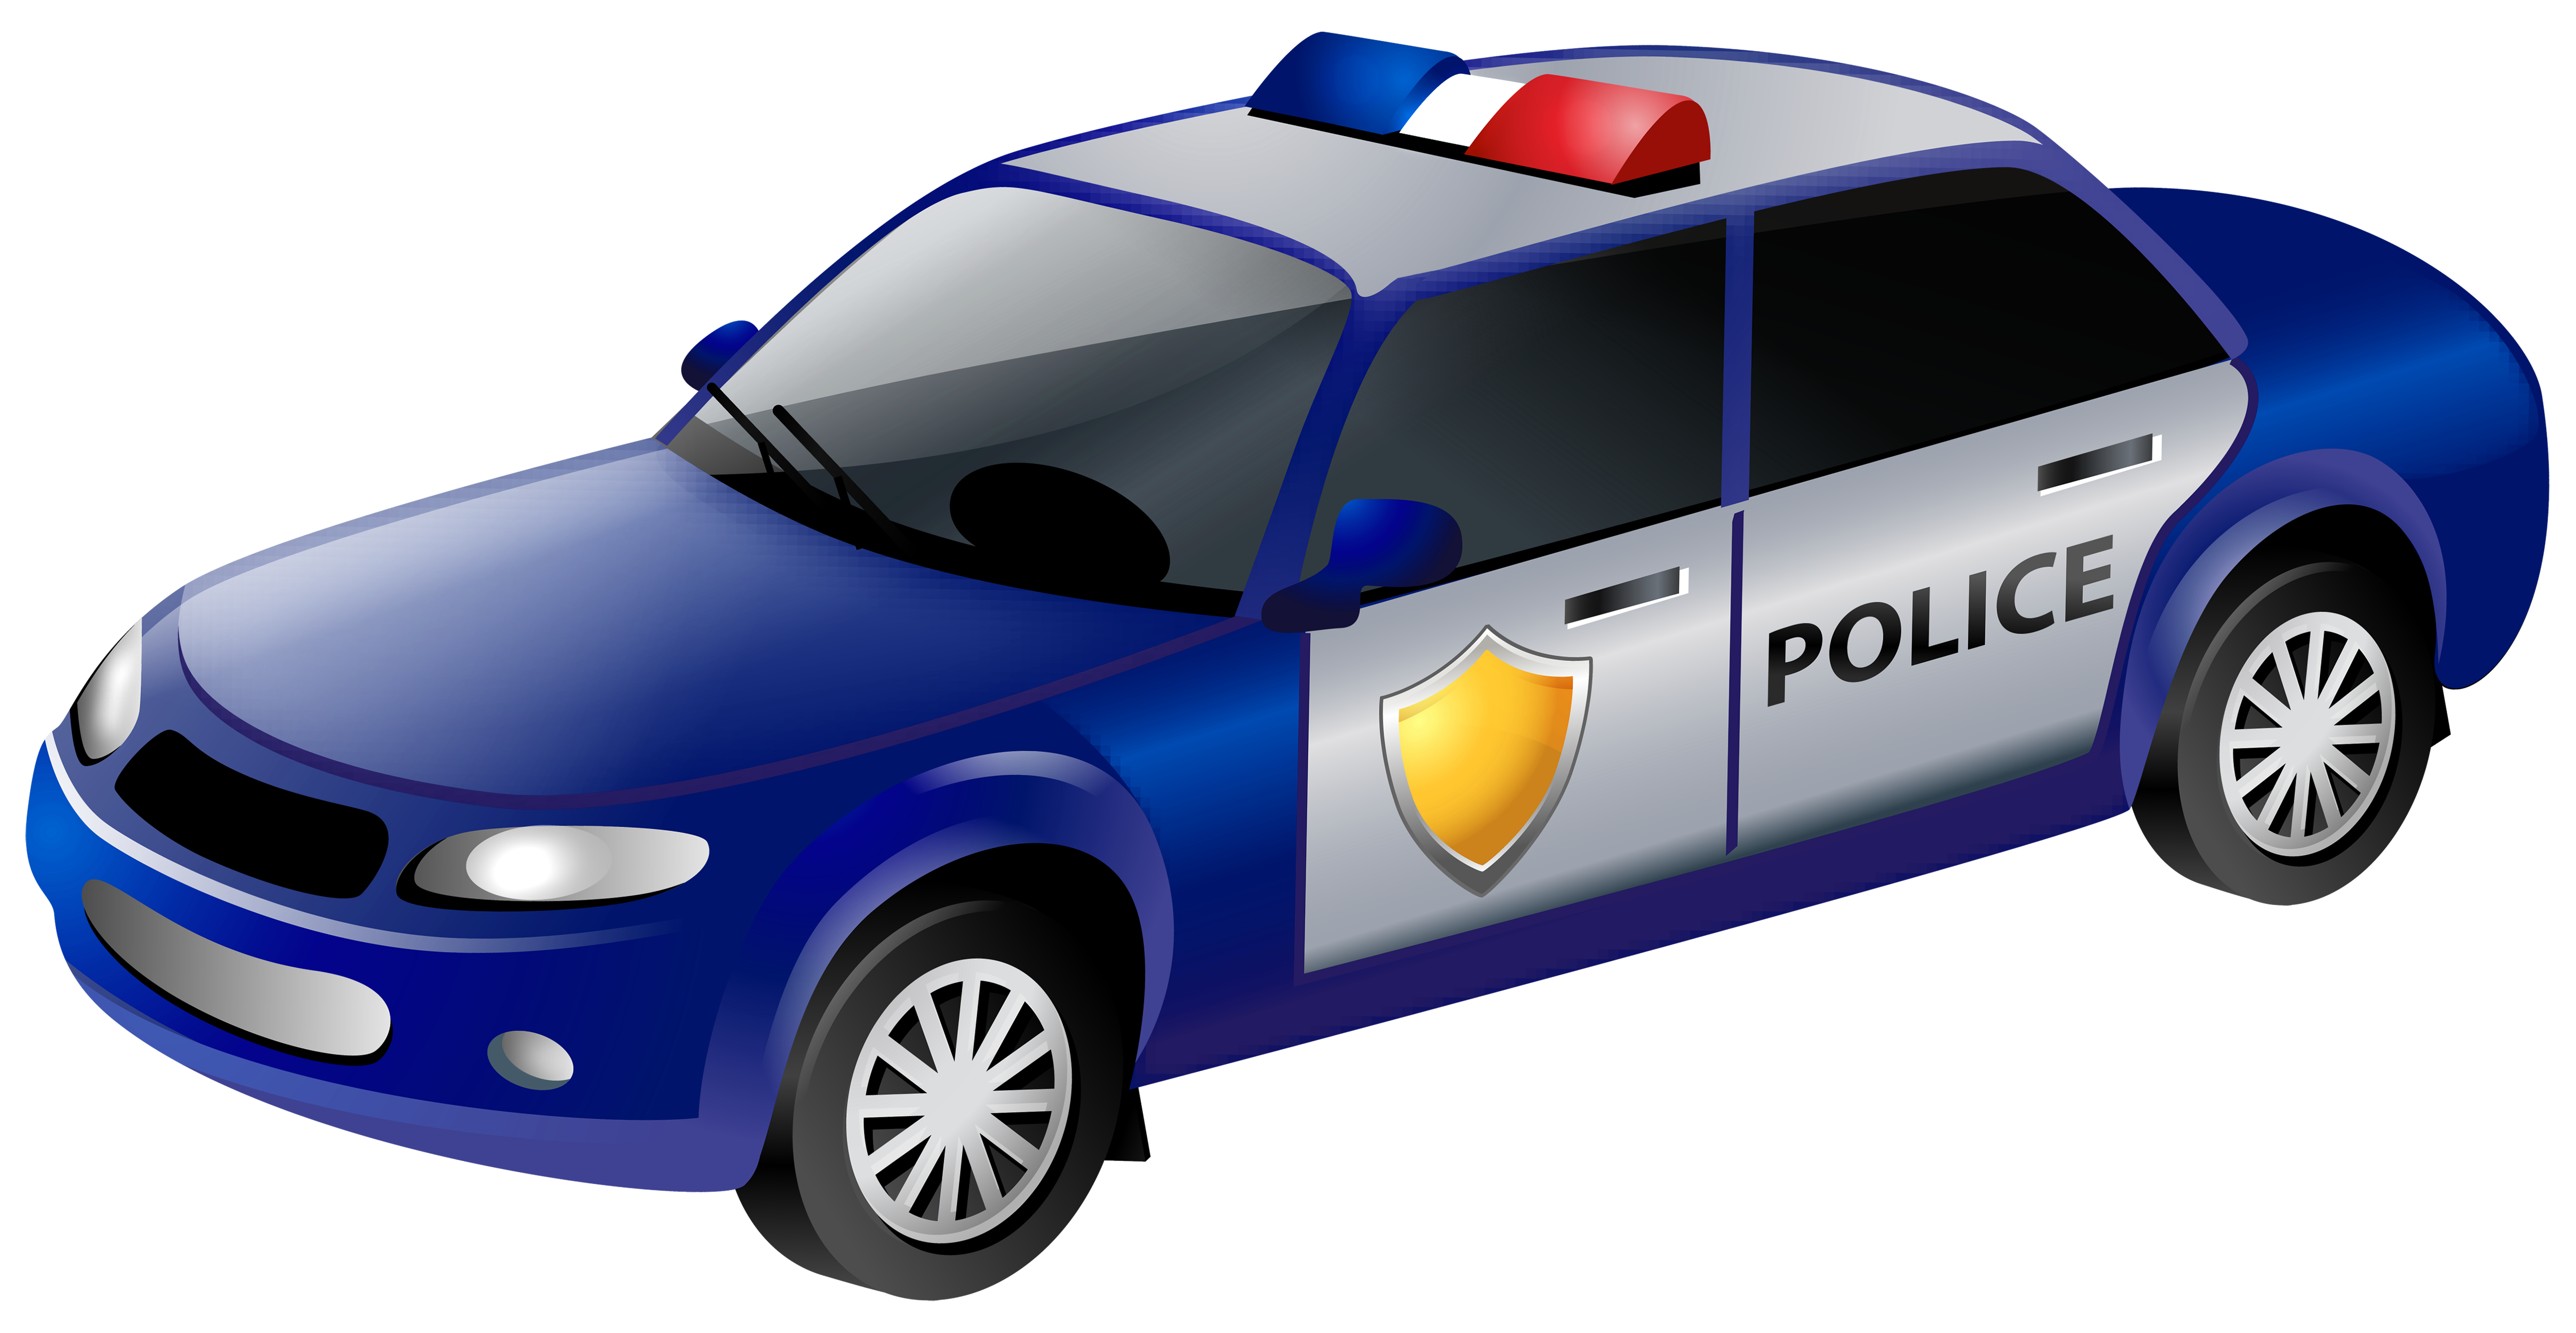 Police Car Png Police Car Police Cars Police Car